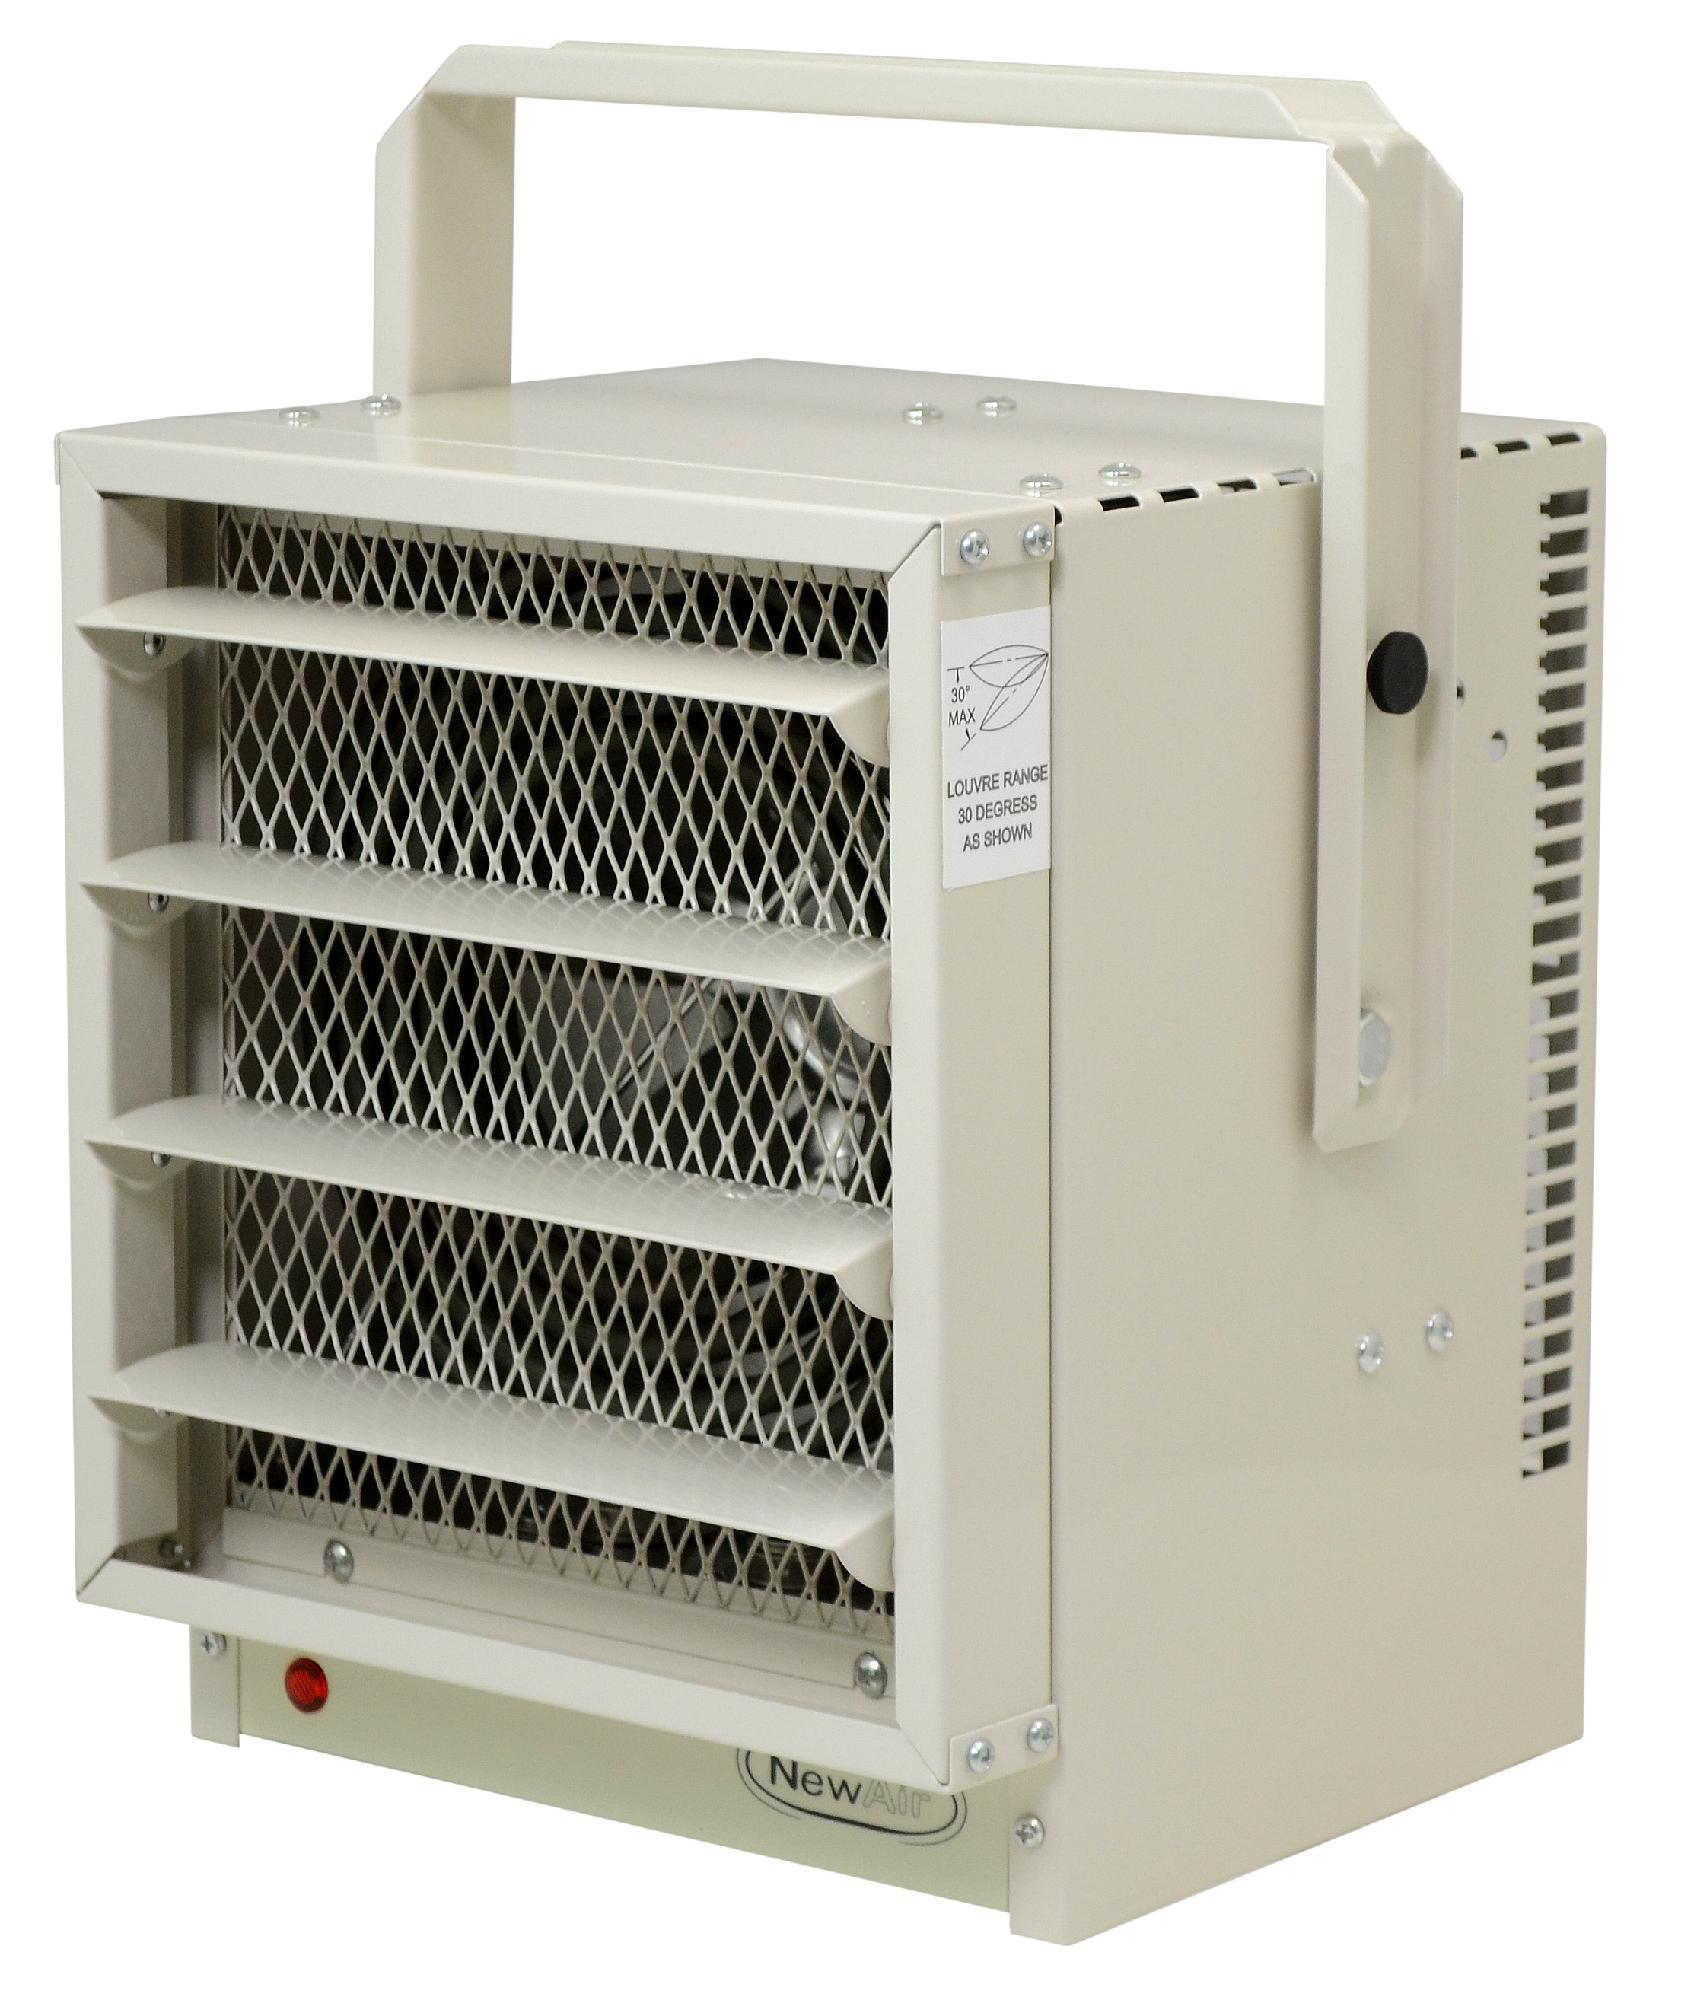 newair g73 electric garage heater newair g73 electric wiring diagram [ 1694 x 2000 Pixel ]